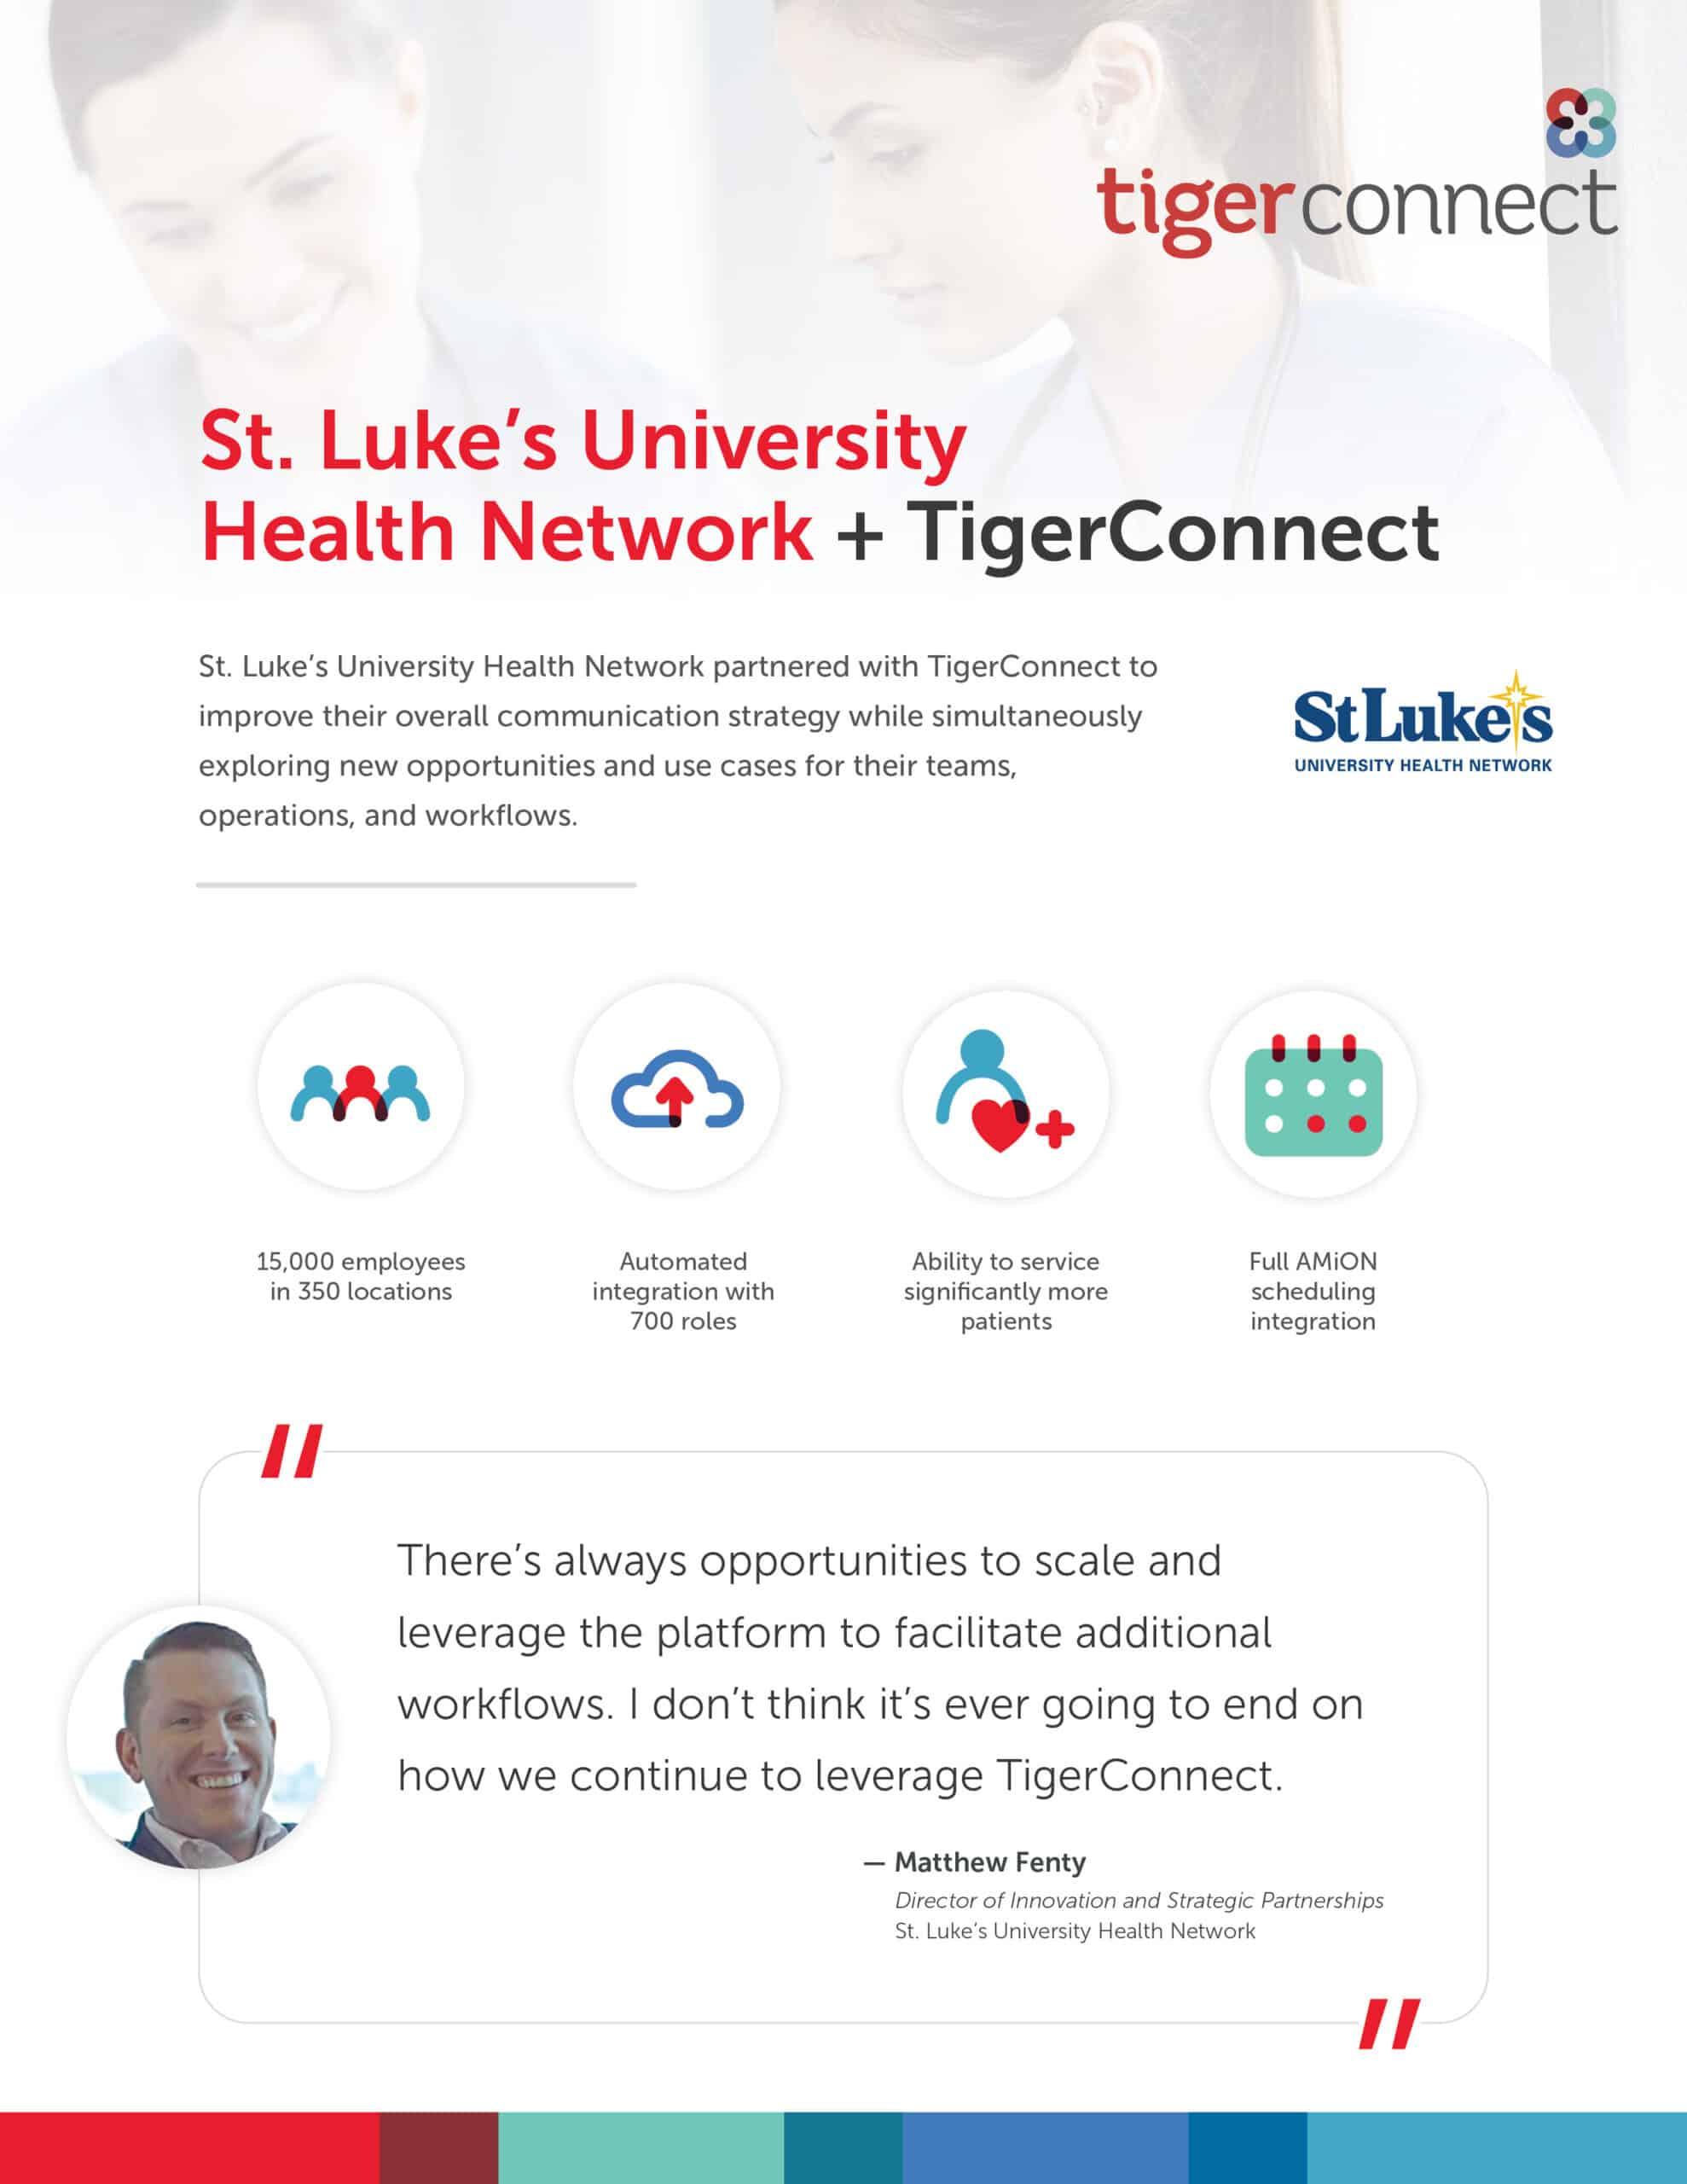 Case Study: St. Luke's University Health Network